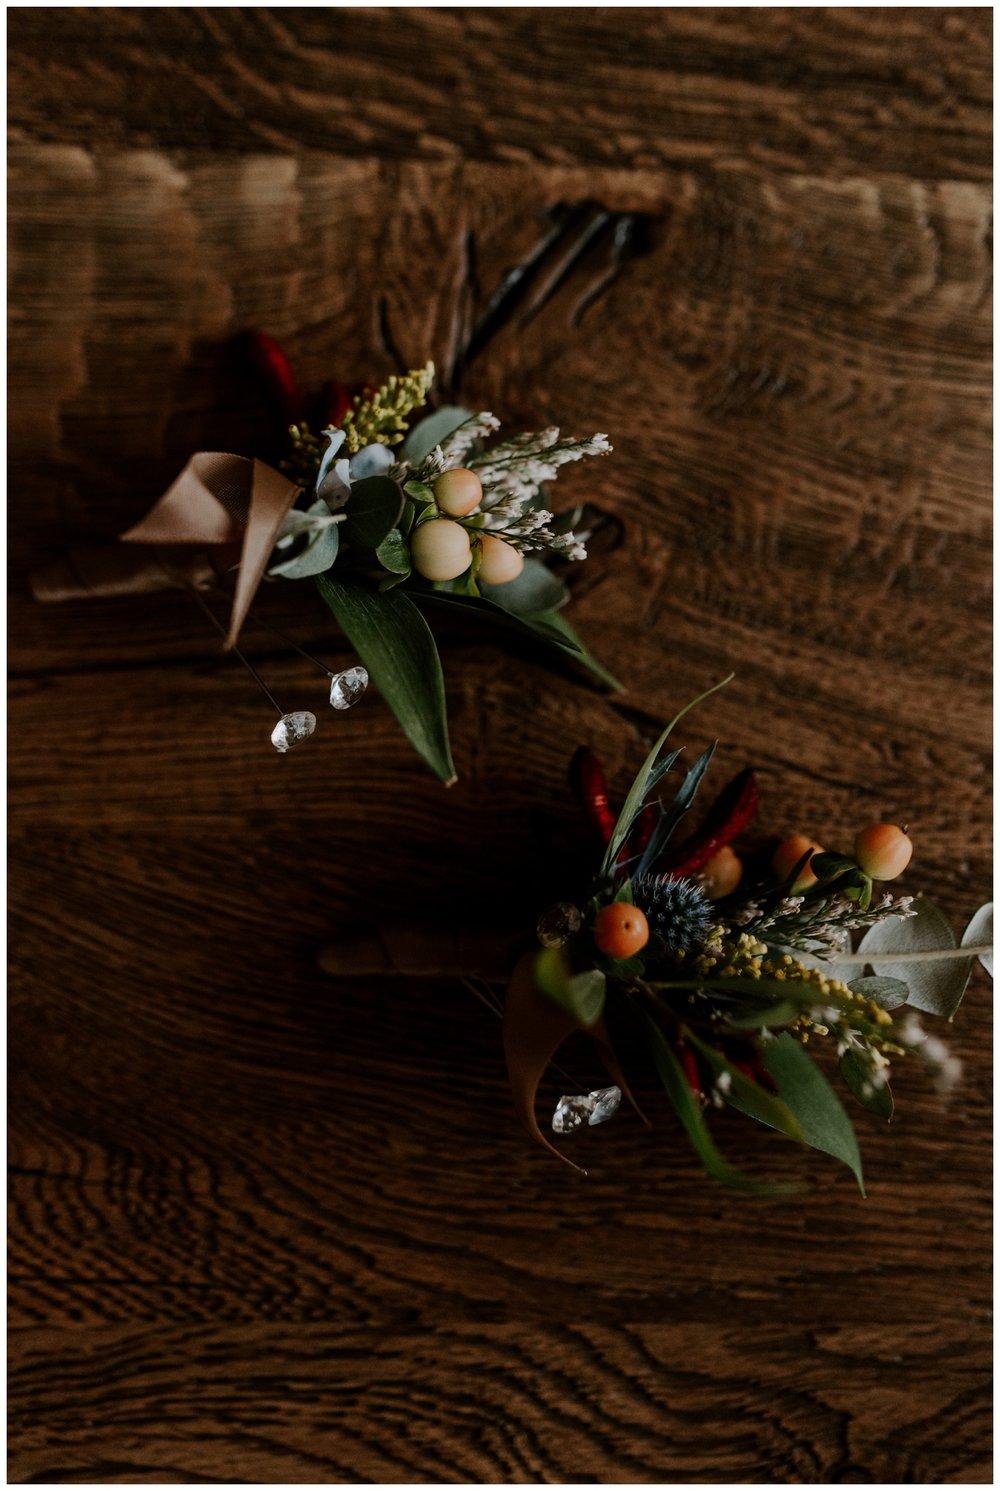 Napa Valley Backyard Wedding and Reception at Elizabeth Spencer Winery | Jessica Heron Images 010.jpg